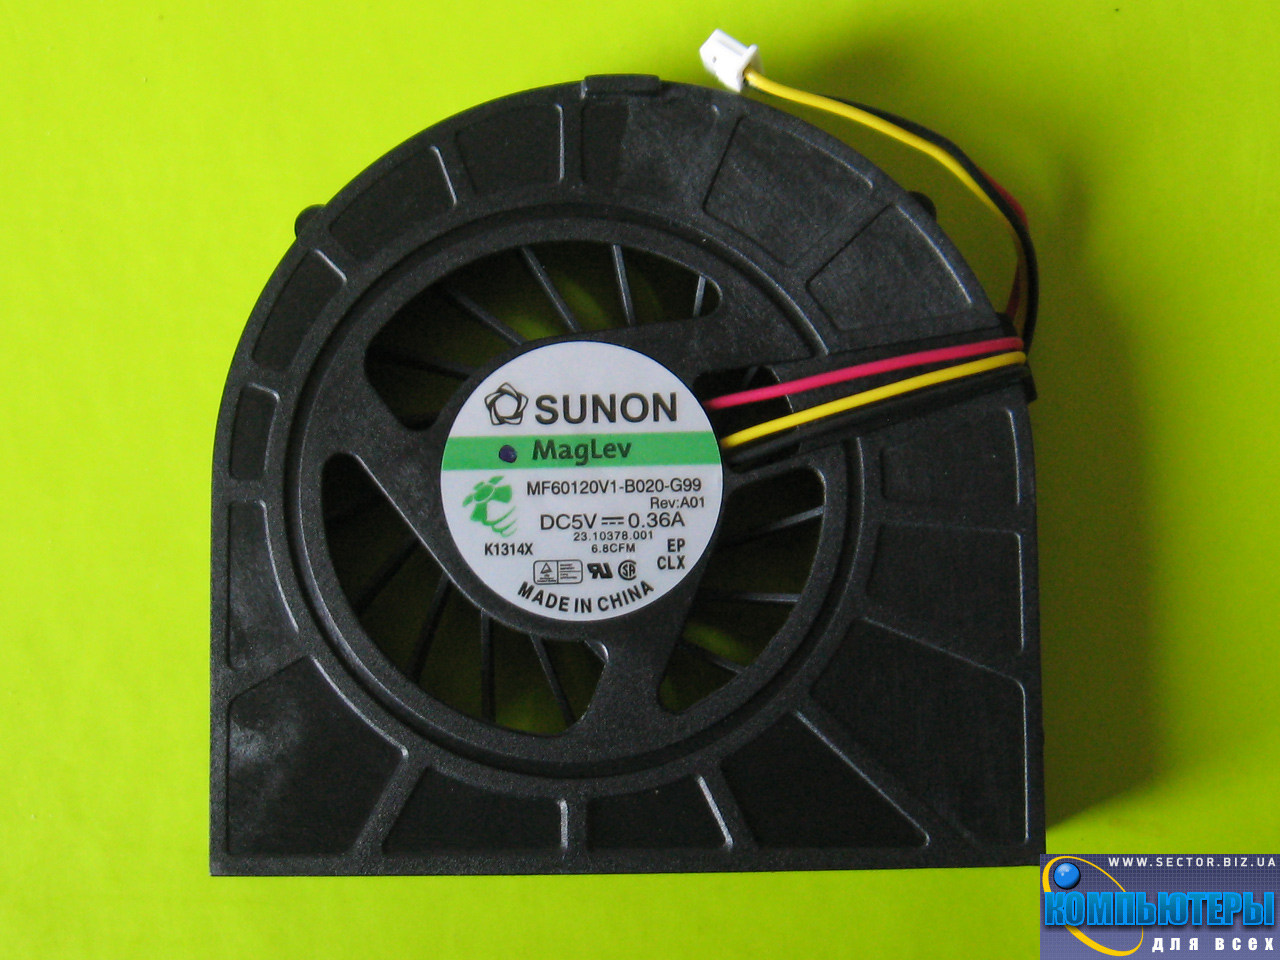 Кулер к ноутбуку Dell Inspiron 15R N5010 M5010 p/n: MF60120V1-B020-G99. Фото № 3.